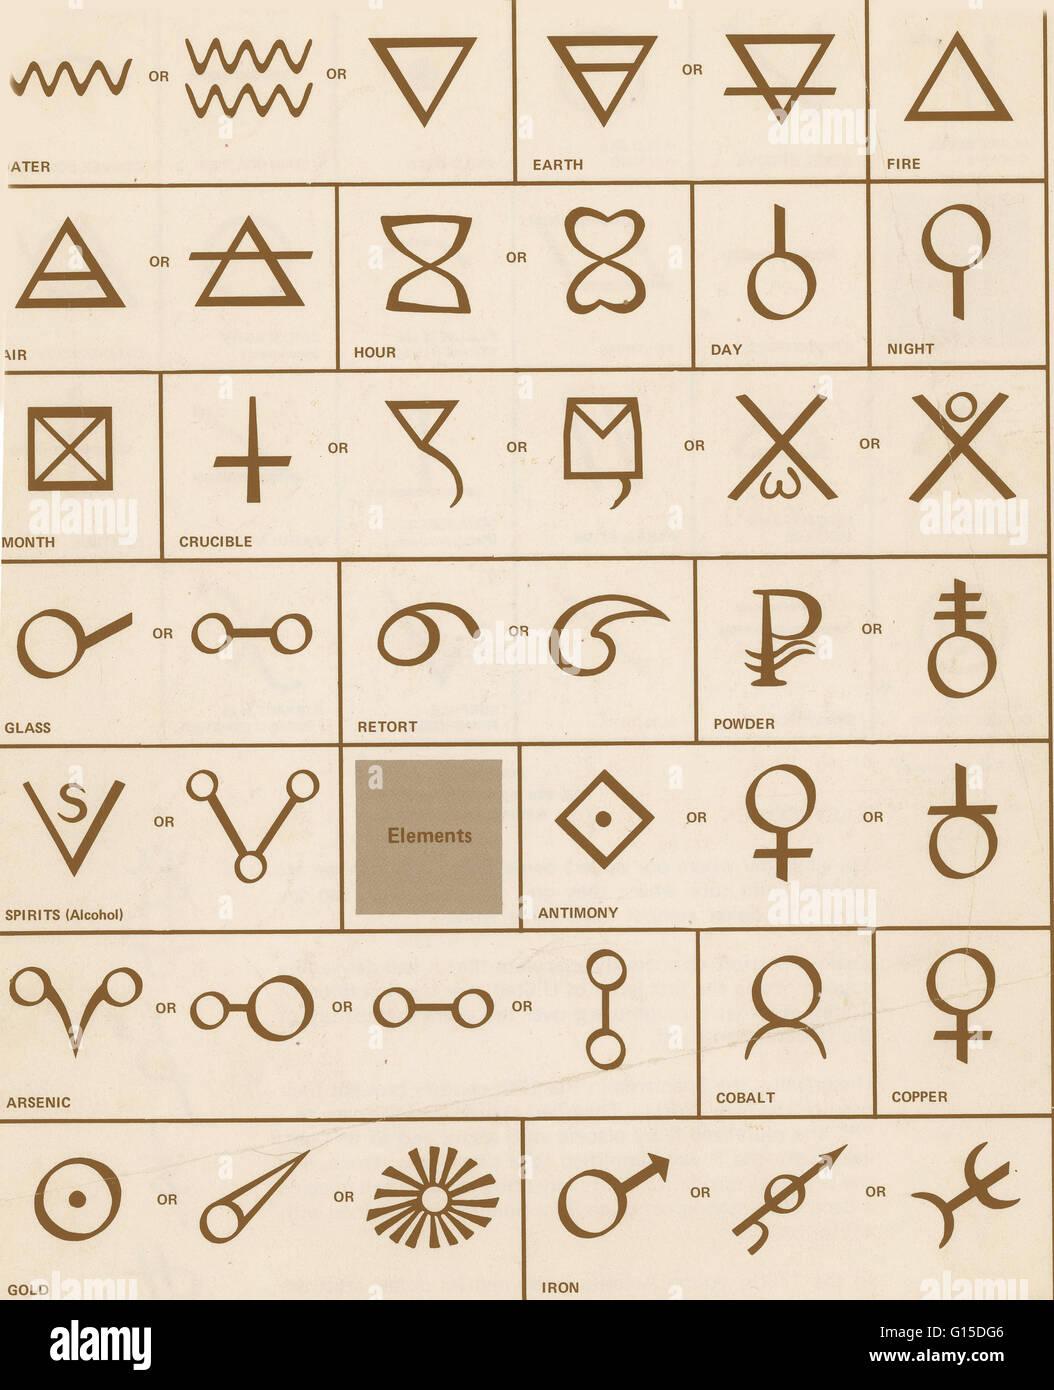 Alchemical Symbols Stock Photos Alchemical Symbols Stock Images